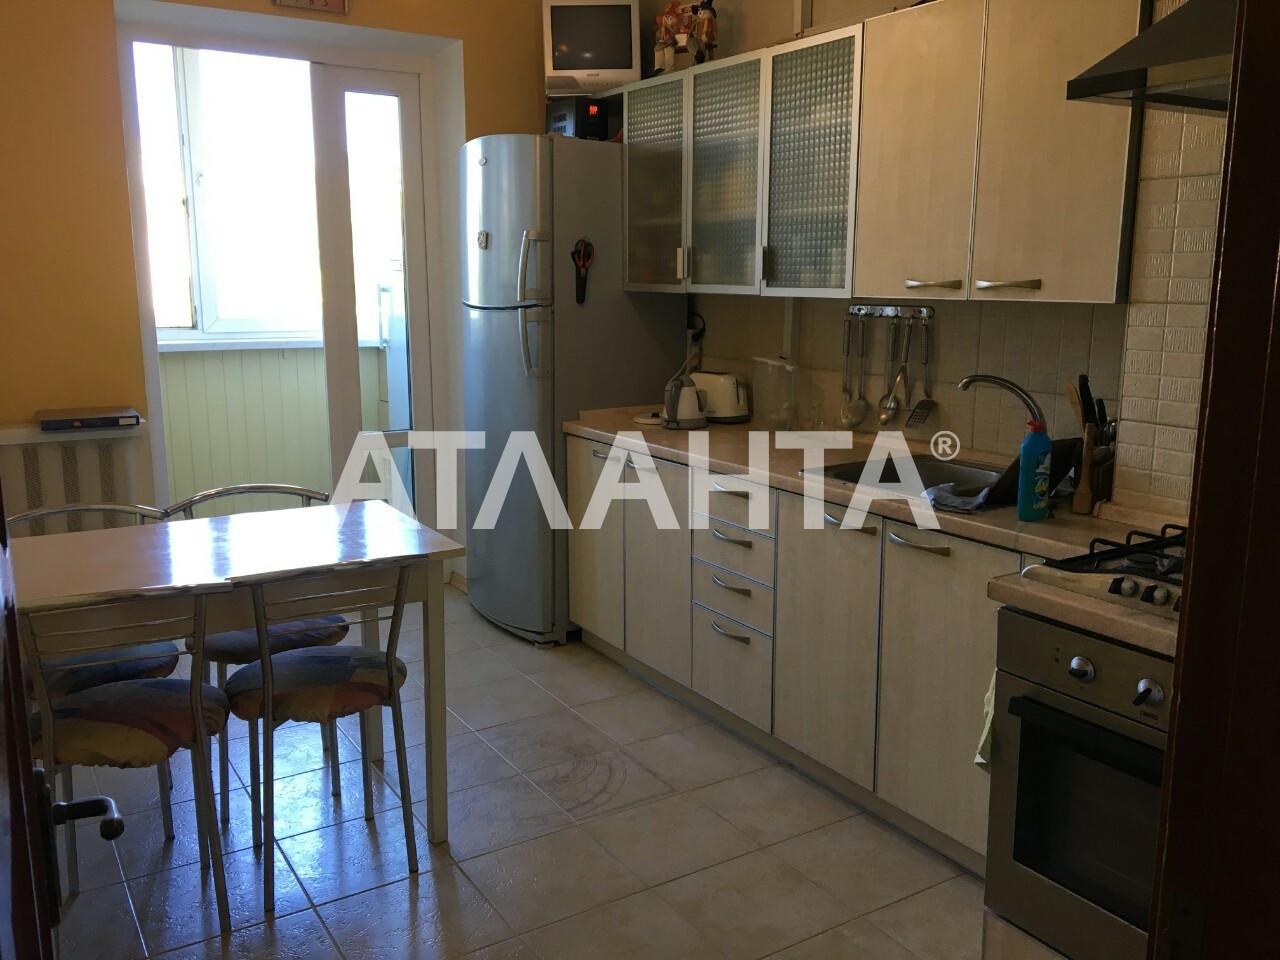 Продается 3-комнатная Квартира на ул. Архитекторская — 49 000 у.е. (фото №6)